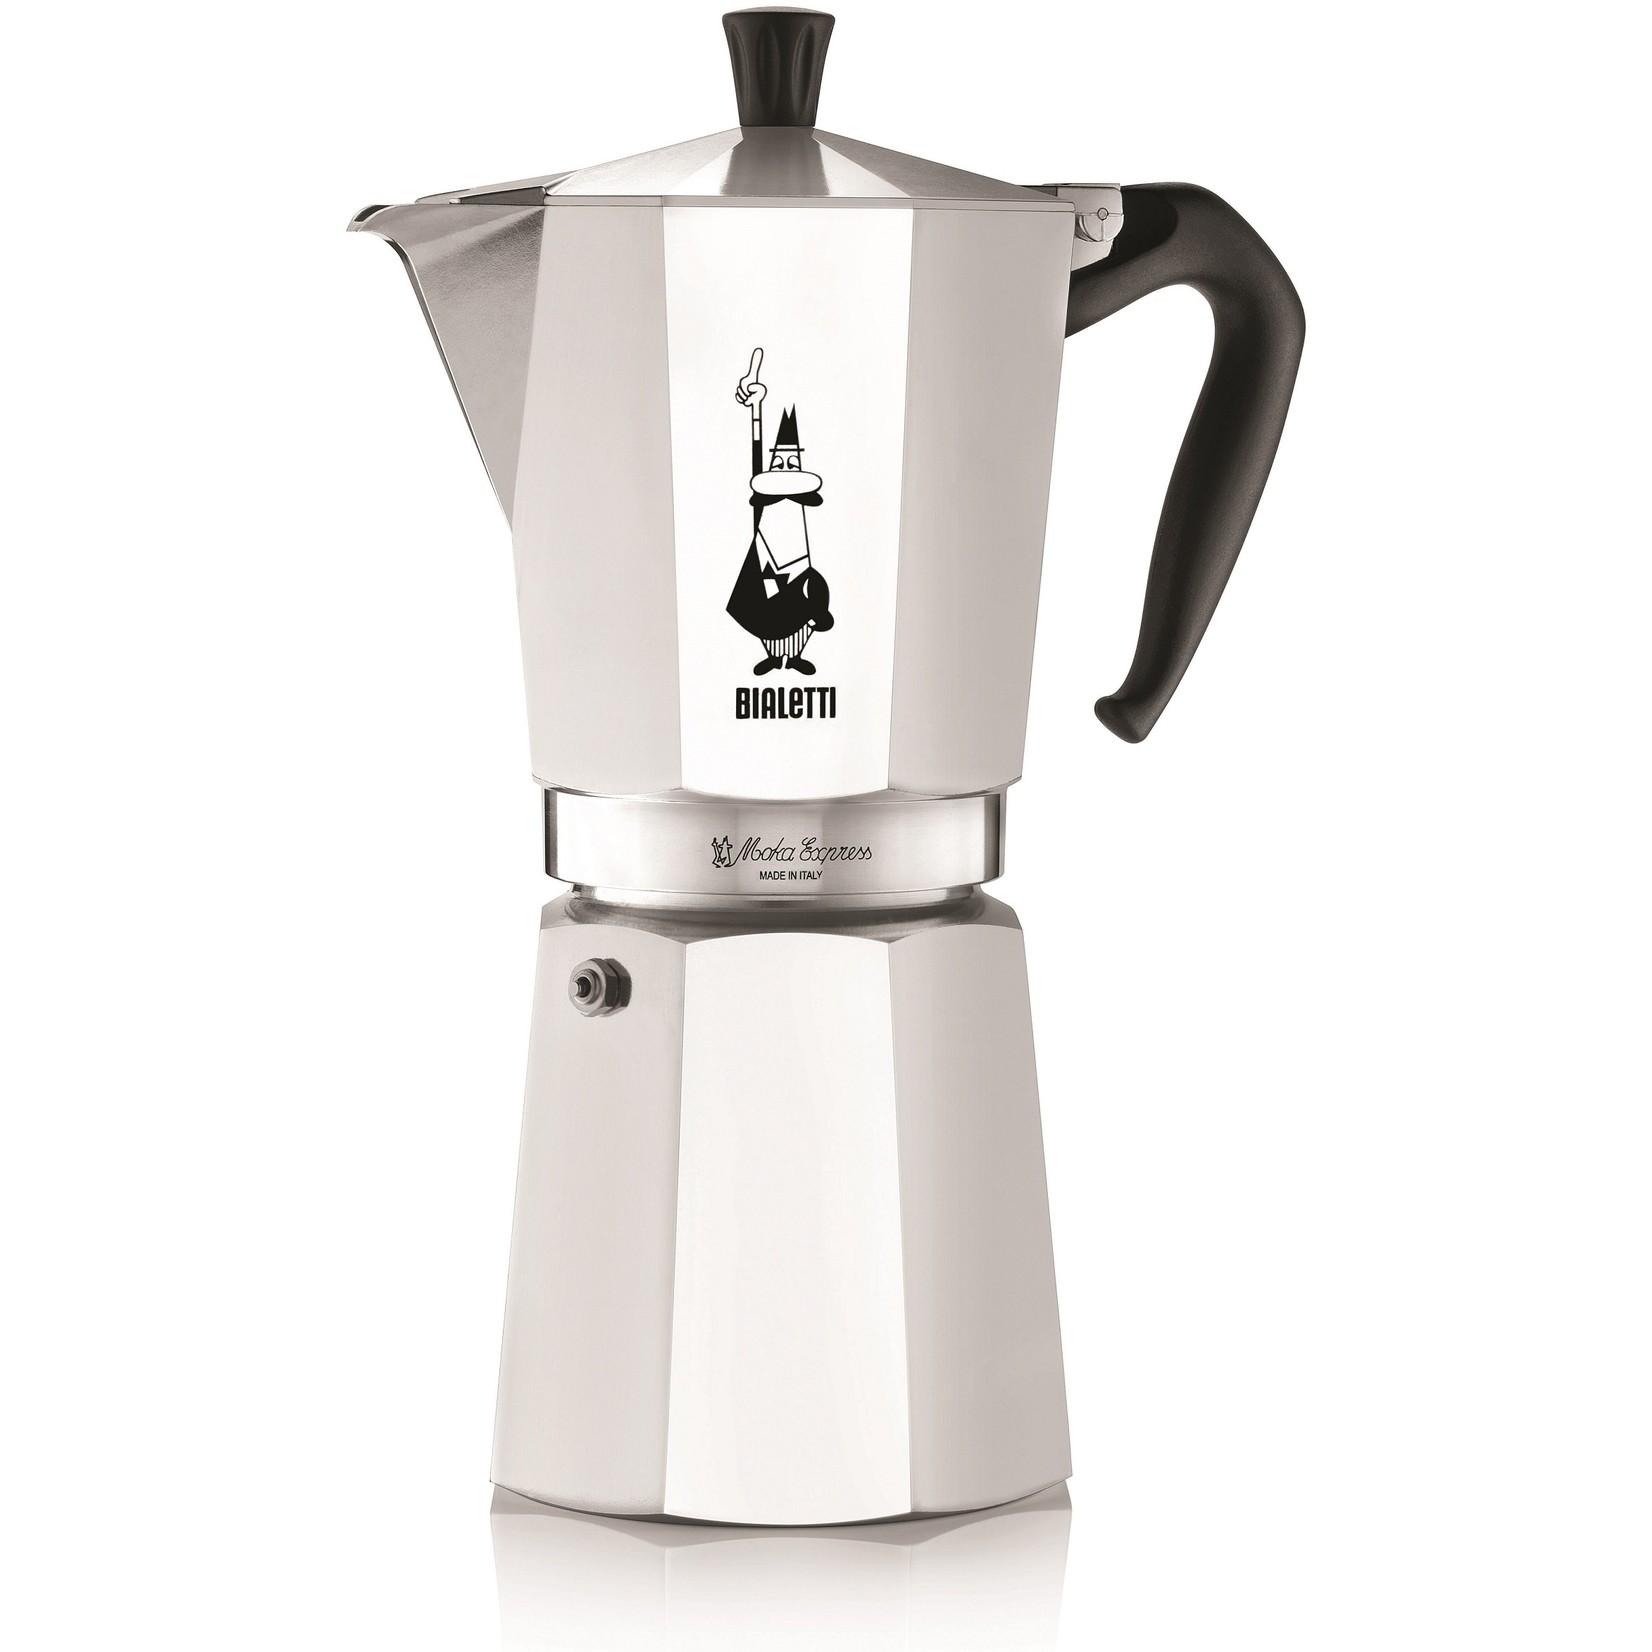 Bialetti Moka Express Classic 12 cup